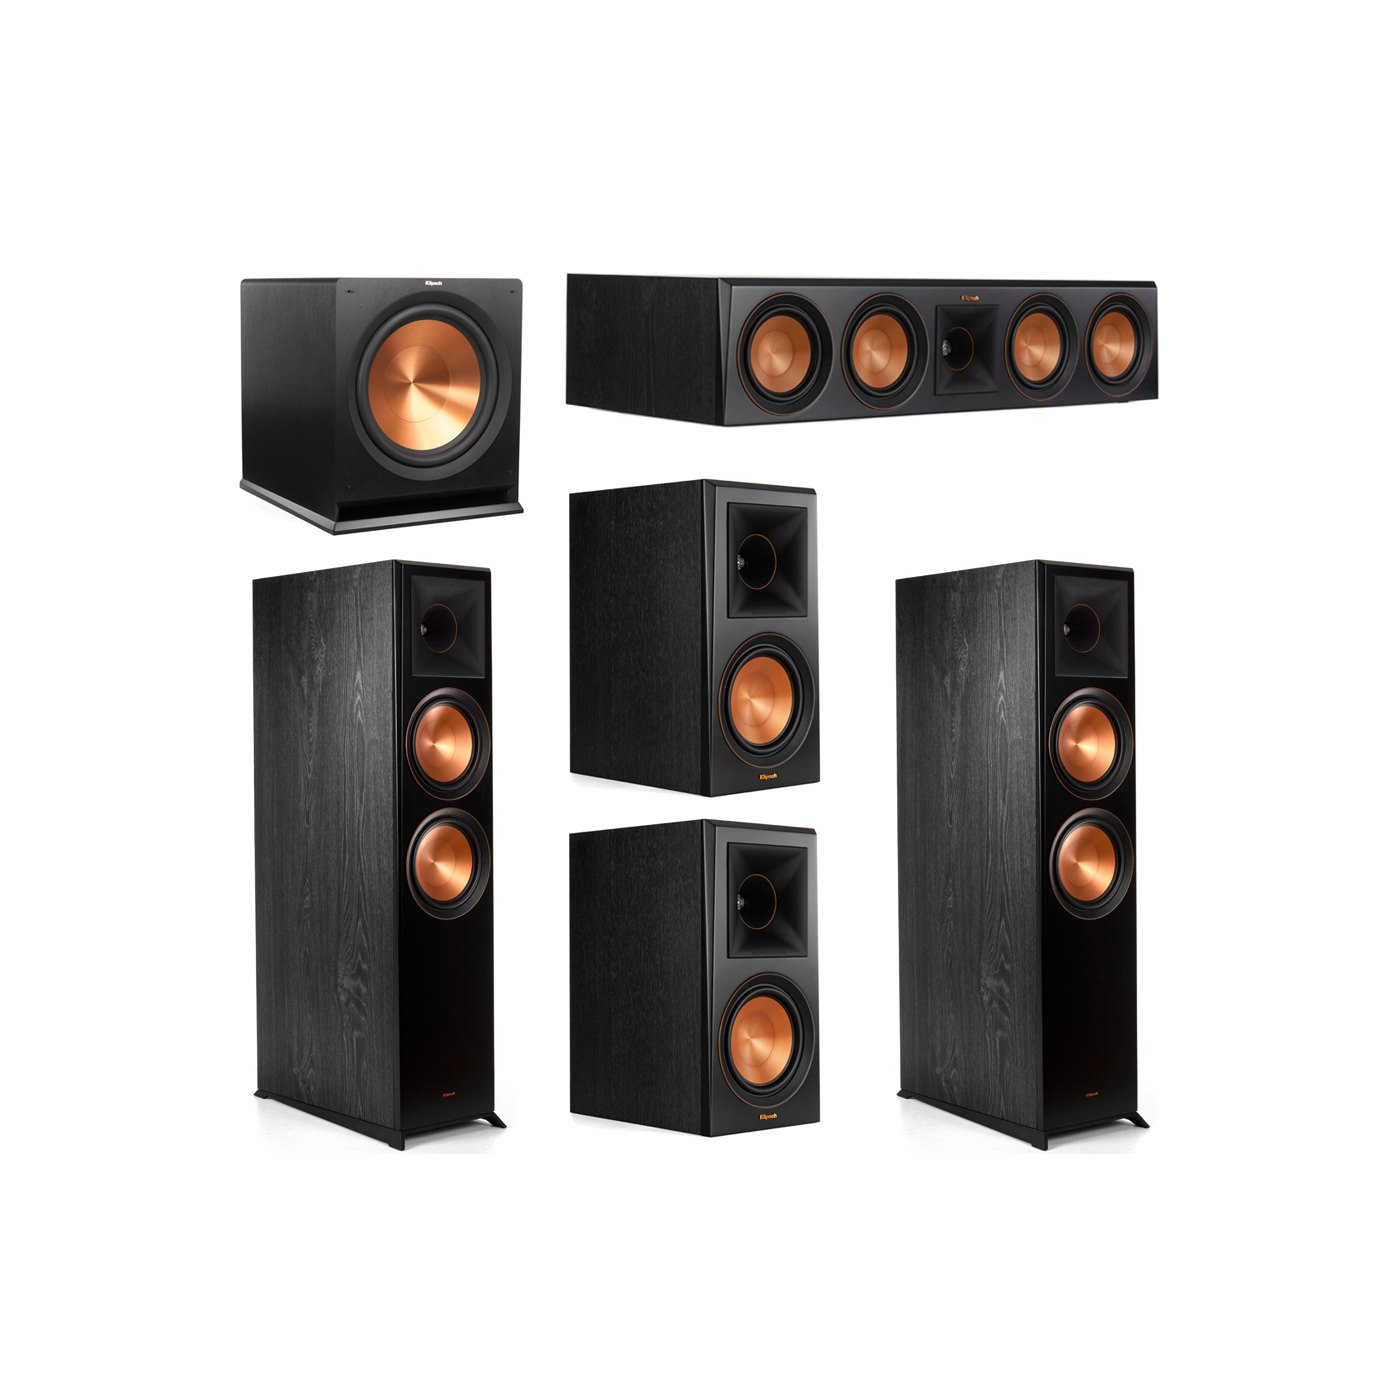 Klipsch 5.1 System with 2 RP-8000F Floorstanding Speakers, 1 Klipsch RP-504C Center Speaker, 2 Klipsch RP-600M Surround Speakers, 1 Klipsch R-115SW Subwoofer